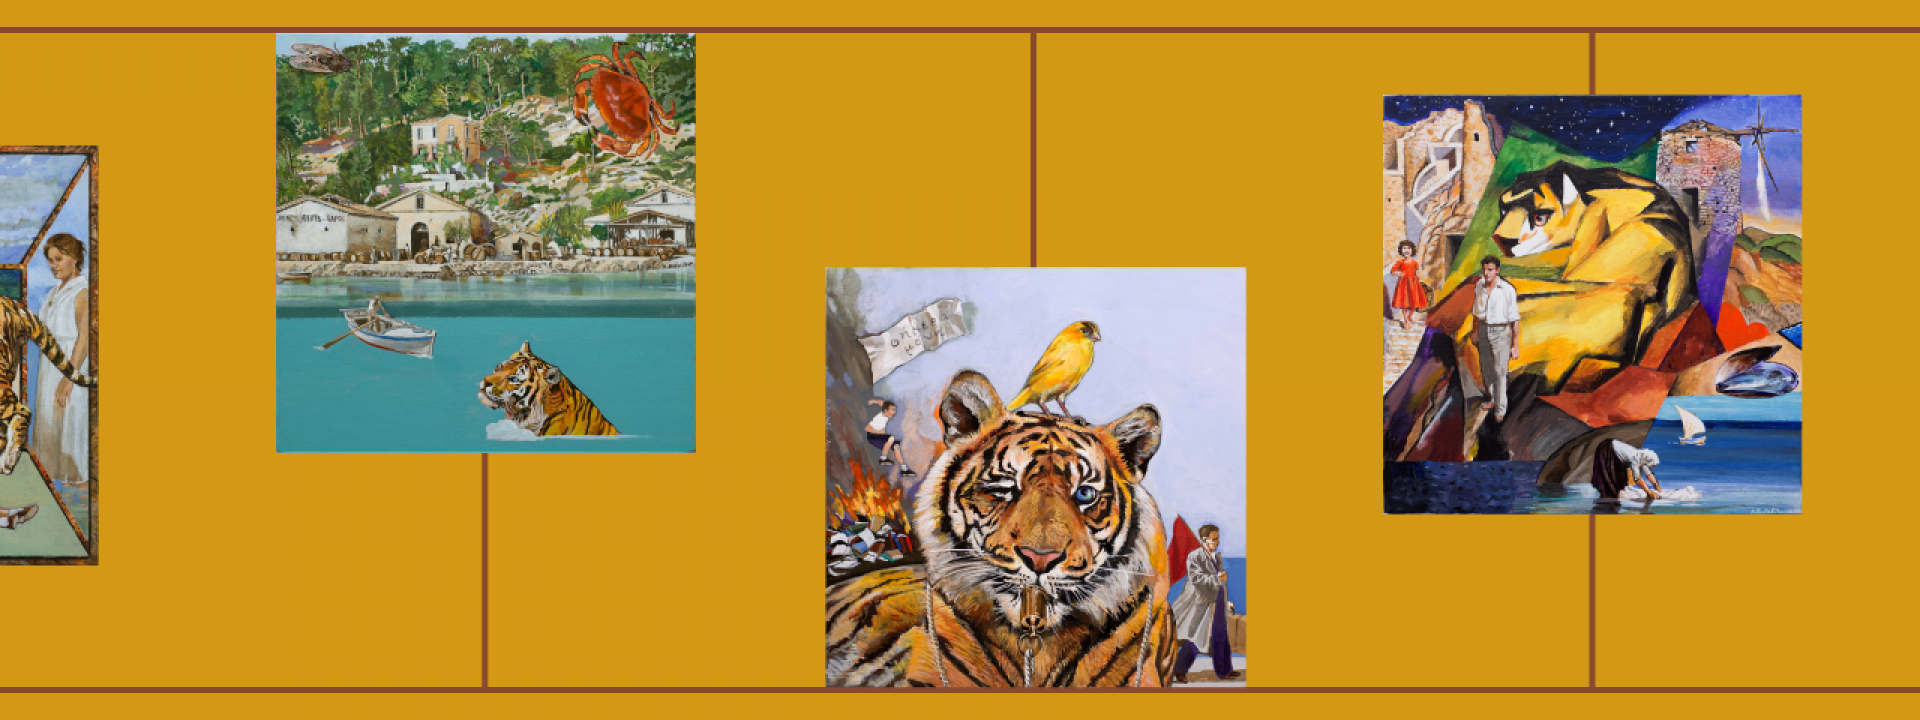 #snfccAtHome Readings: Alki Zei - Wildcat Under Glass - Εικόνα